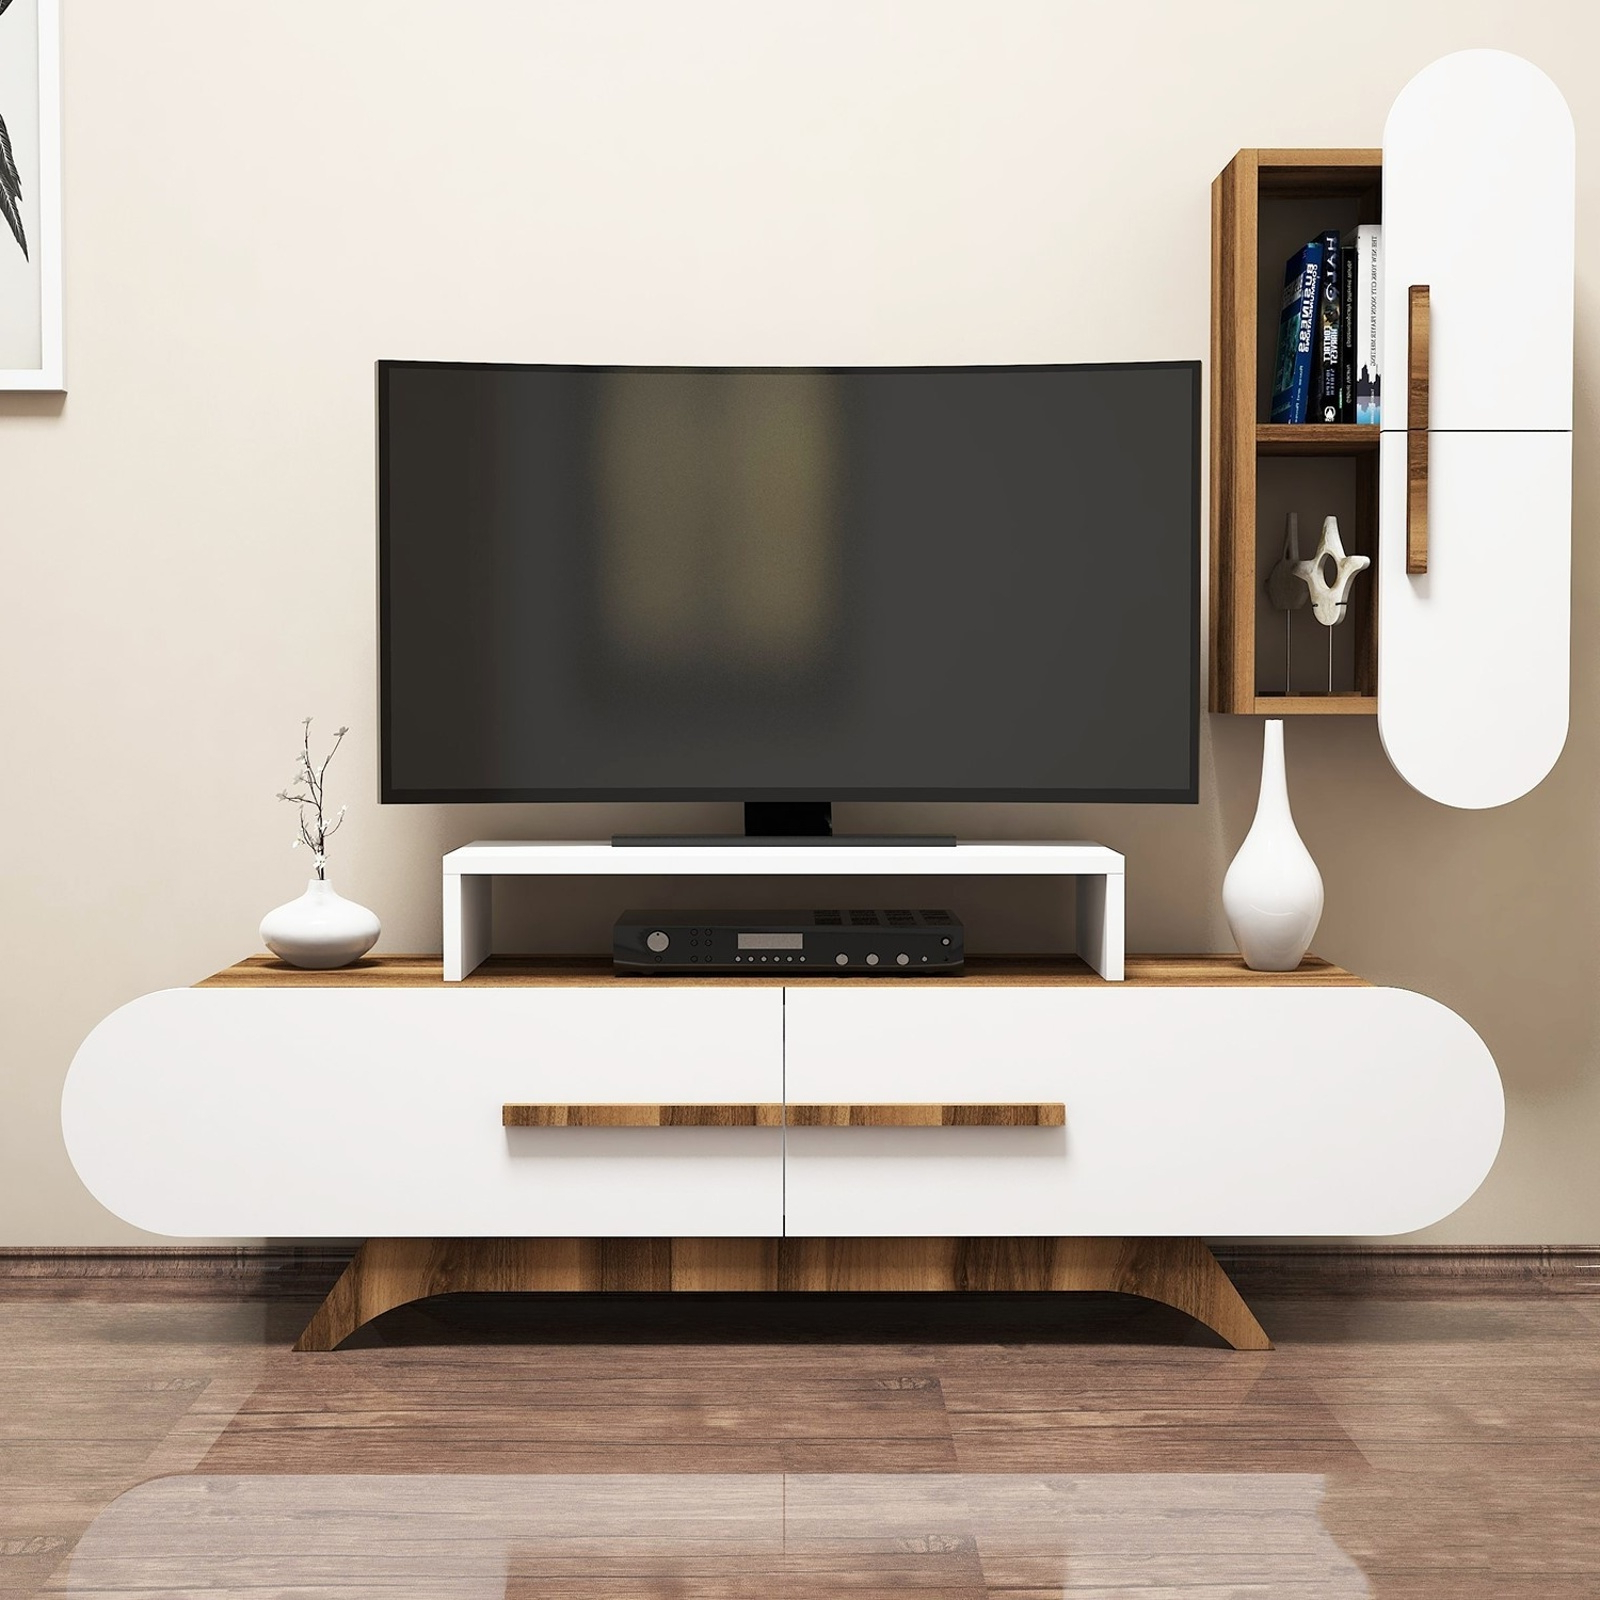 Variant Rose Duvar Raflı Tv Sehpası Ceviz Beyaz | Yukko Intended For Ducar 84 Inch Tv Stands (View 15 of 20)